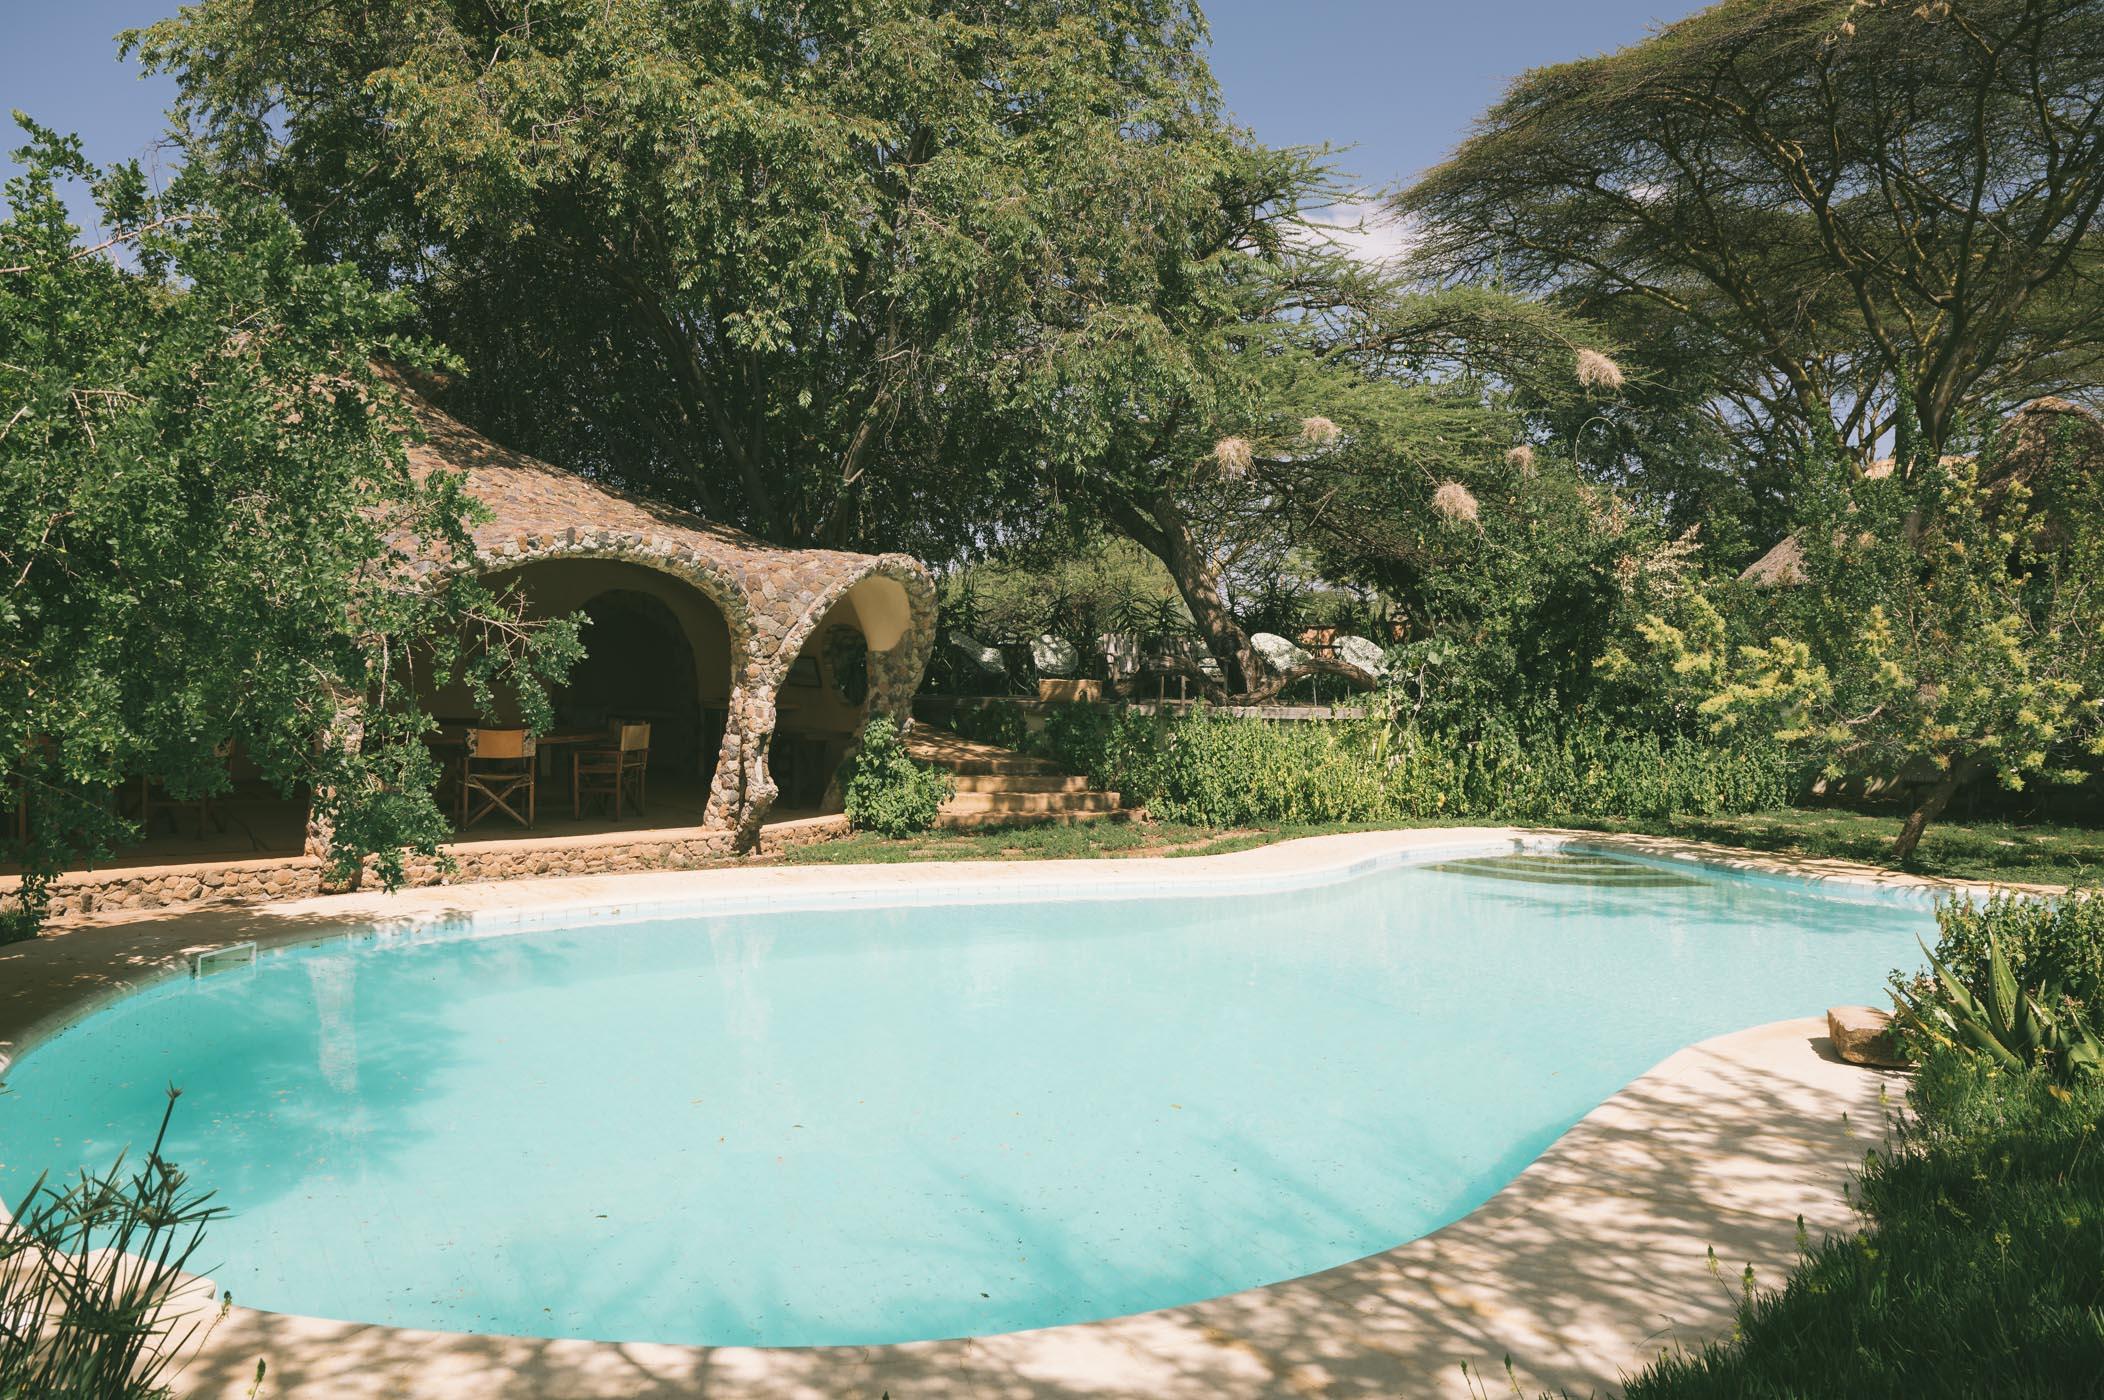 Pool at Lewa House at Lewa Wildlife Conservancy Kenya